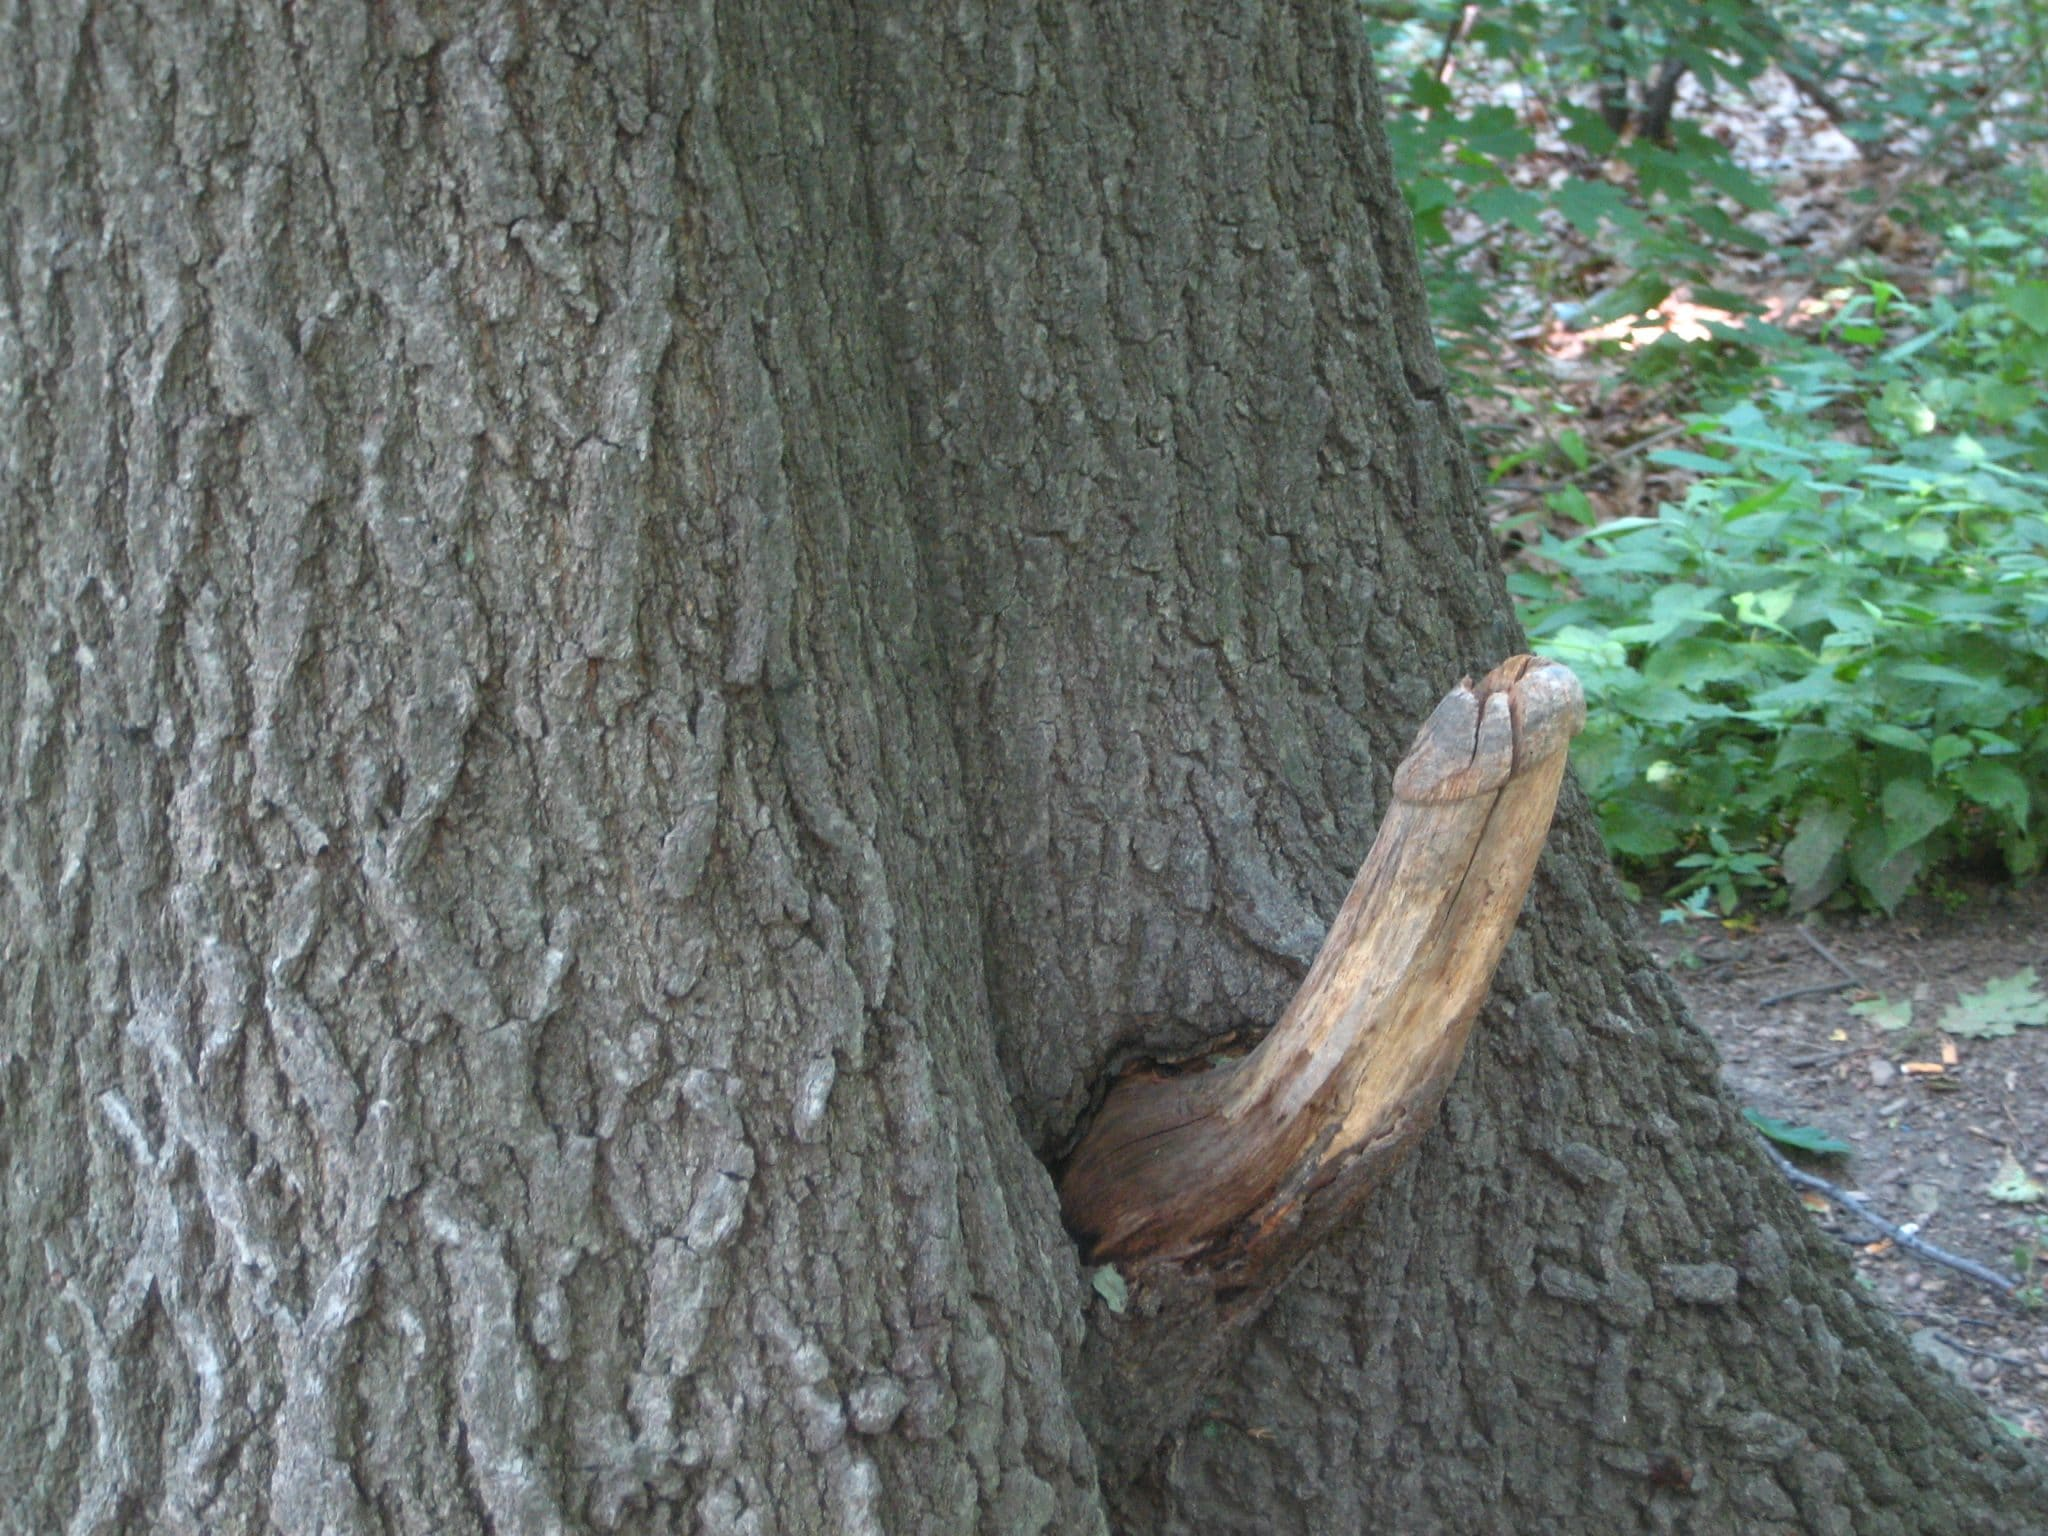 Tree that looks like a dick